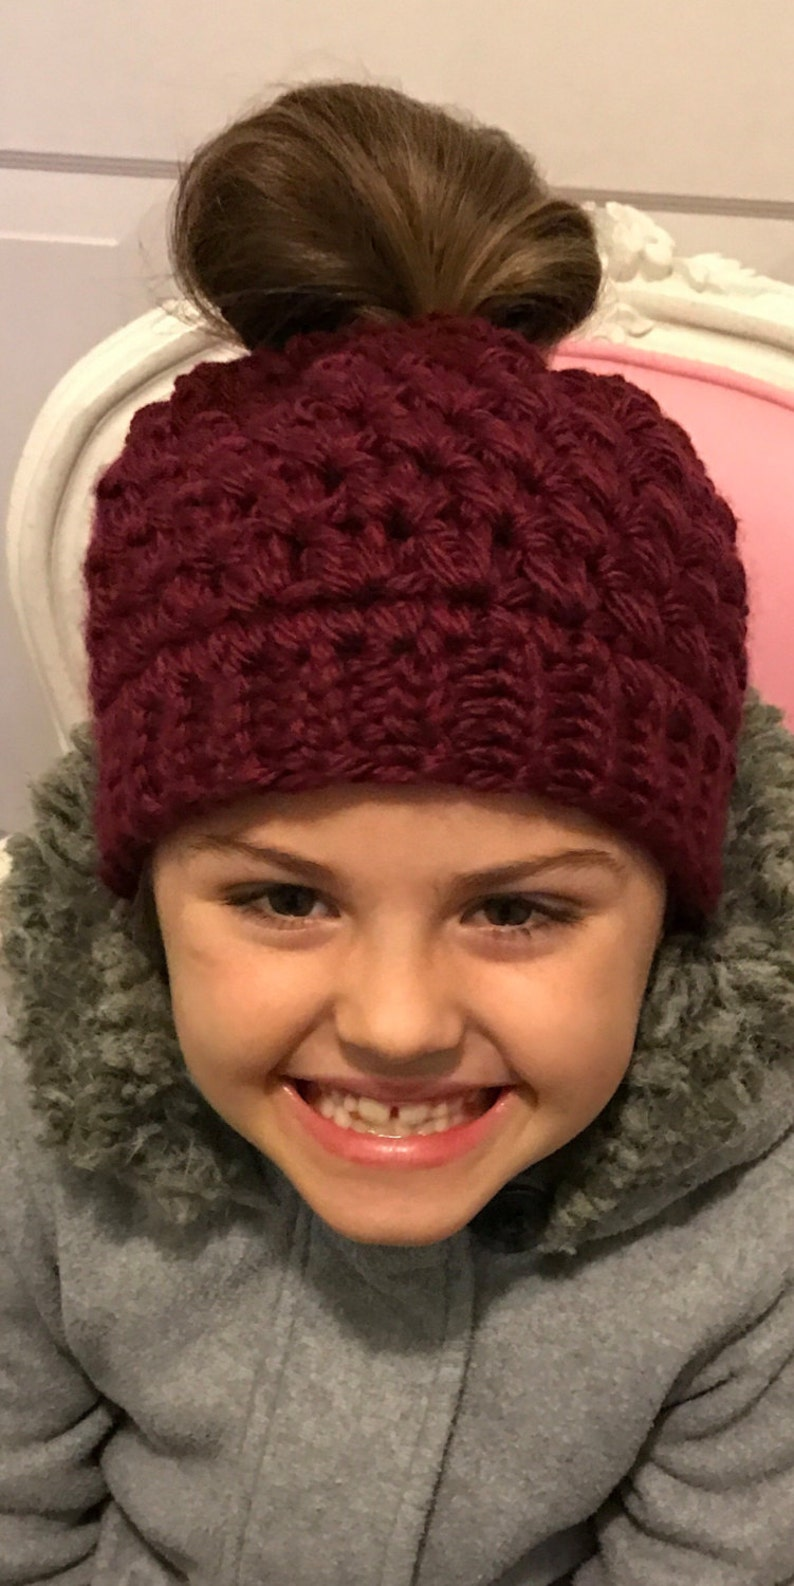 Crochet Maroon Burgundy Pinot Wine Color Ponytail Beanie Messy Bun Hat Runner Jogging Hat Skiing Hat Girl Teen Woman Winter Snow Gift